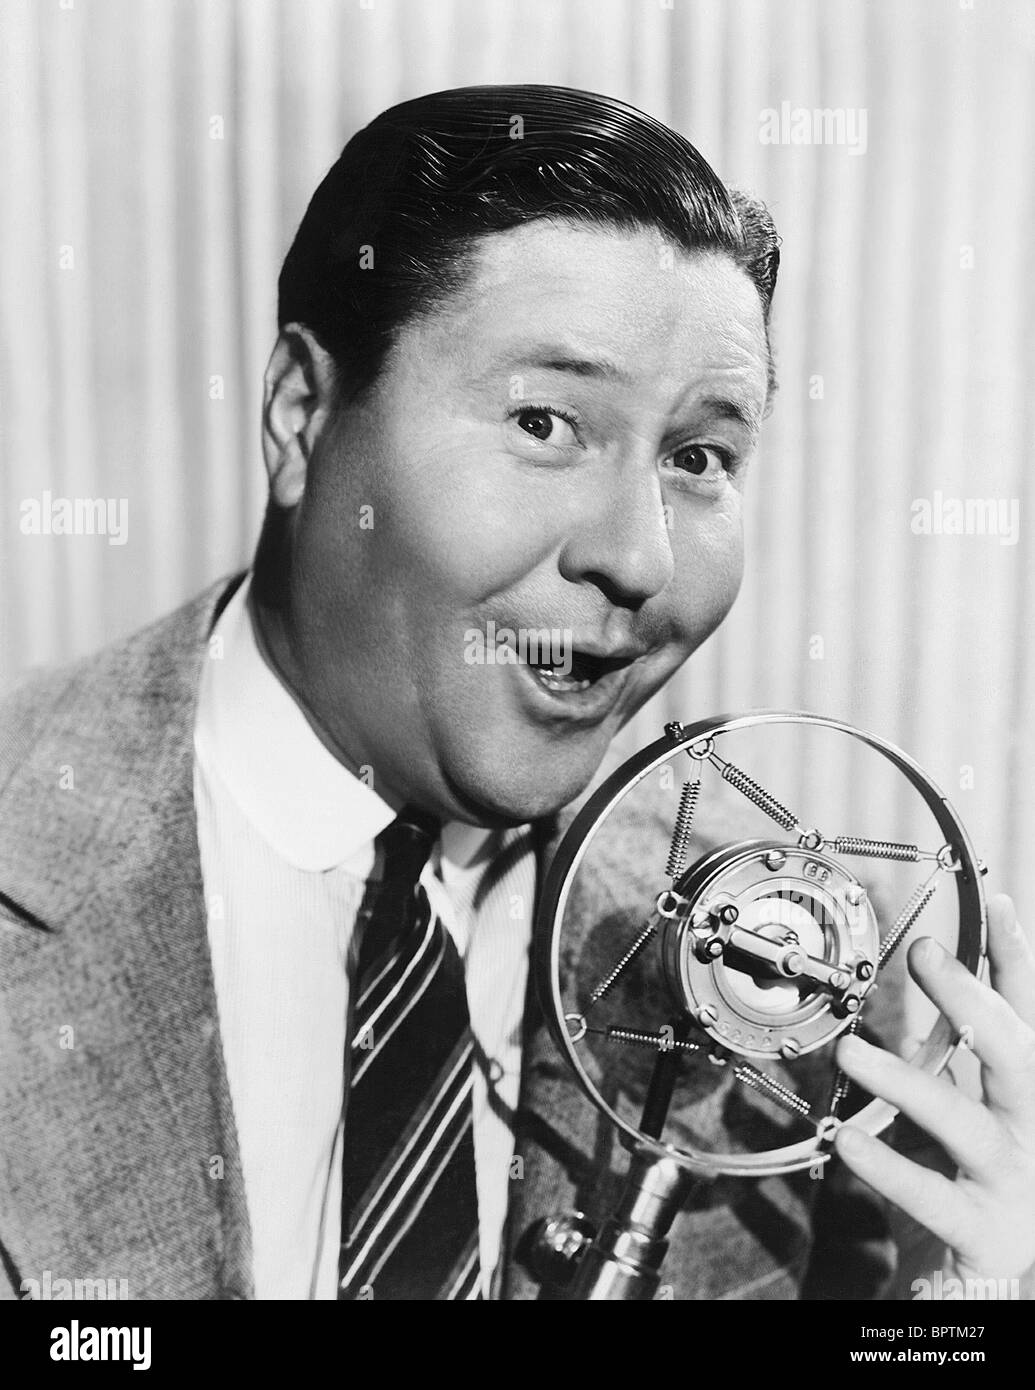 JACK OAKIE ACTOR (1940) - Stock Image